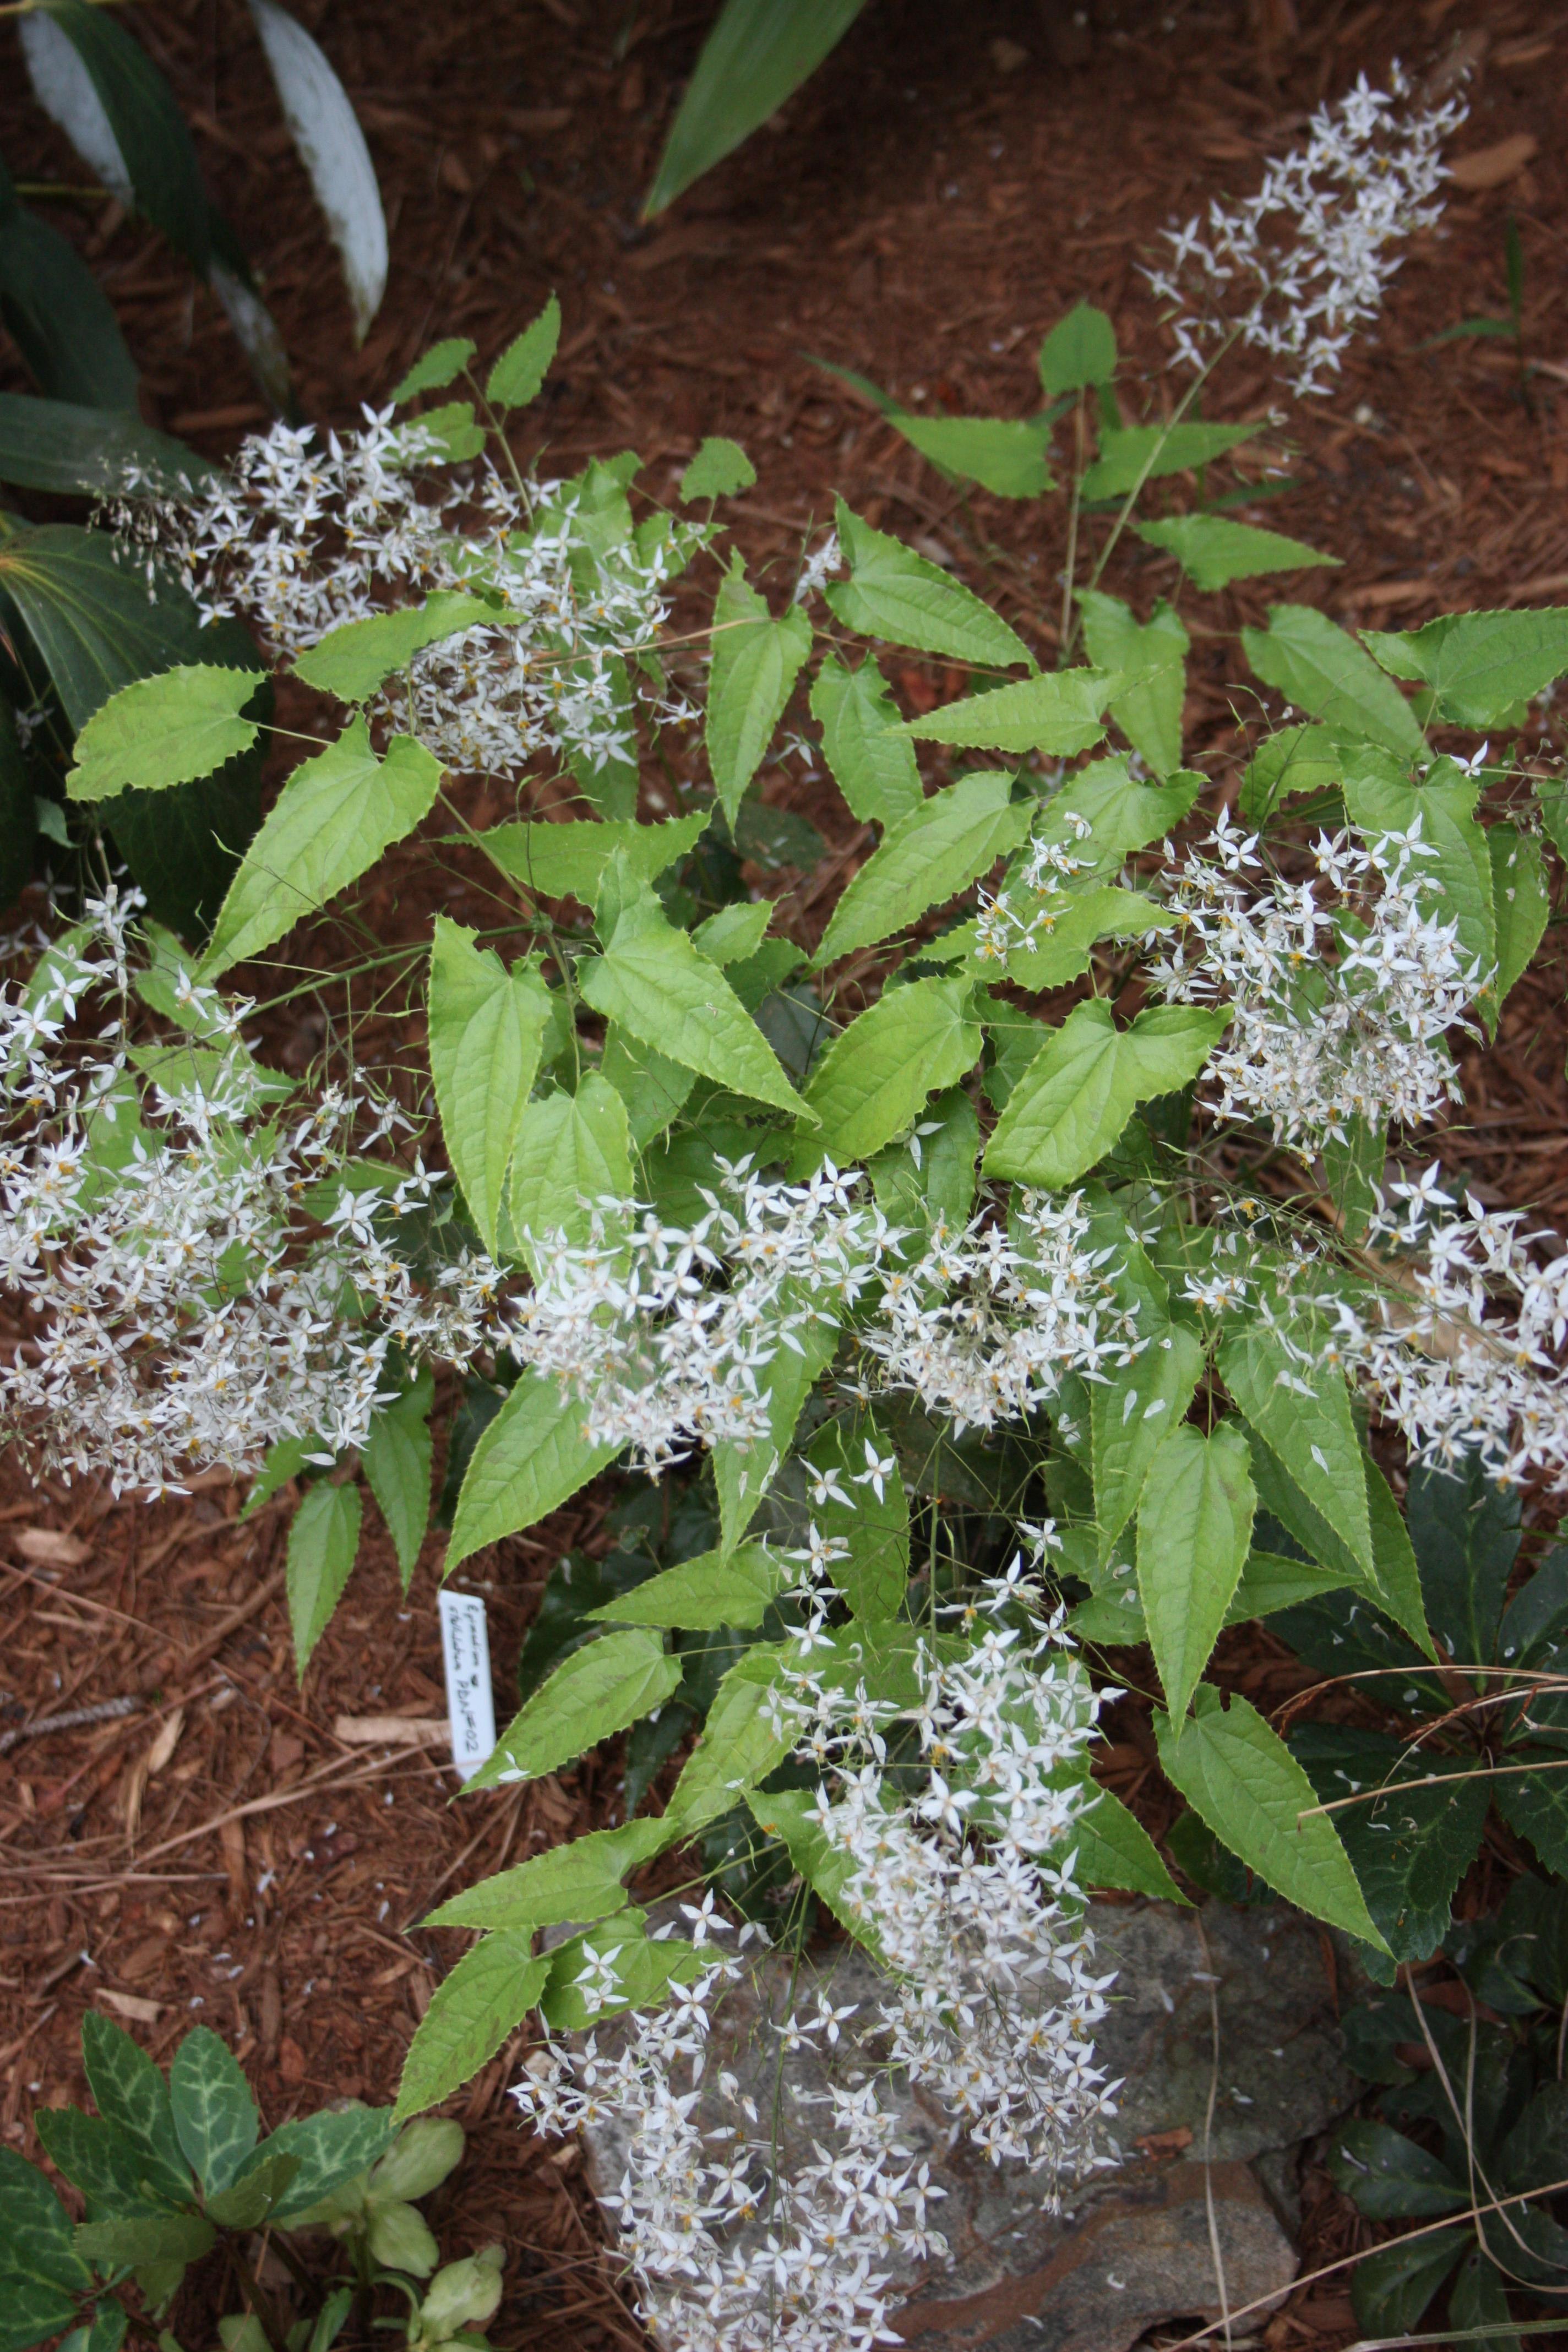 Epimedium stellulatum 'Alotastellulata' @ JLBG - a JLBG/PDN seedling, not introduced yet